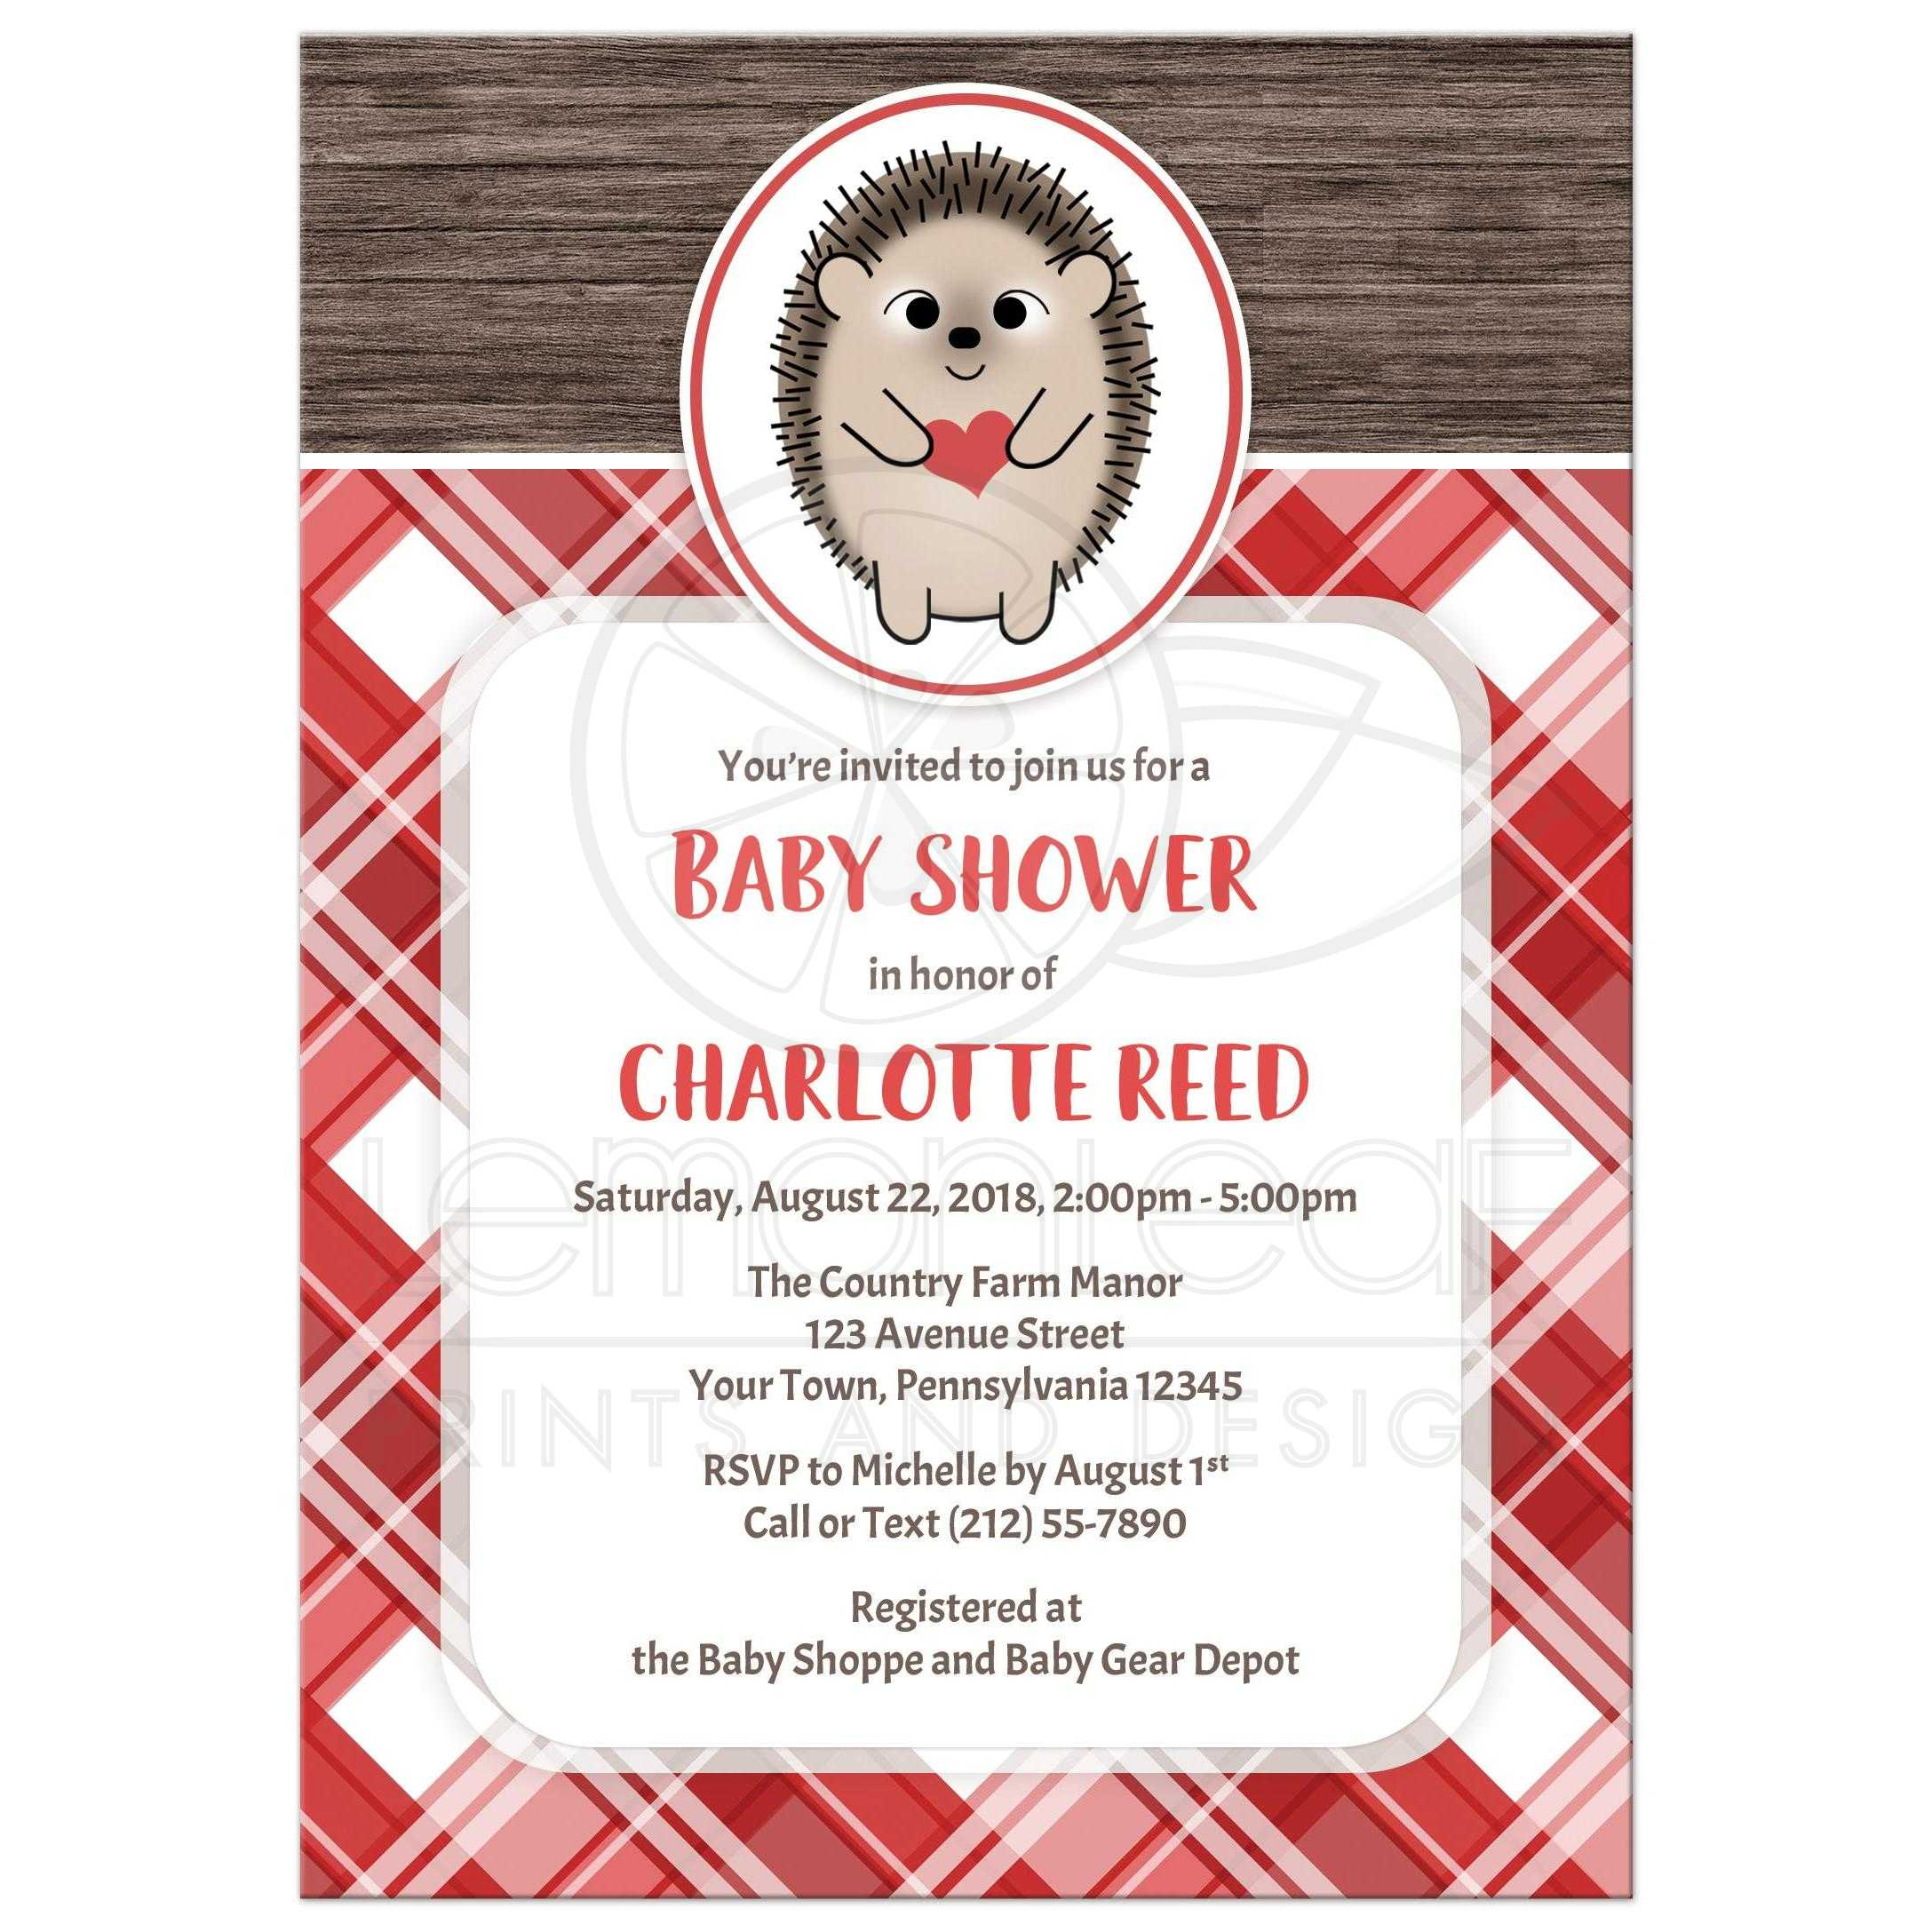 54338 Rectangle Rustic Hedgehog Heart Wood Red Plaid Baby Shower Invitations Jpg T 1525889885